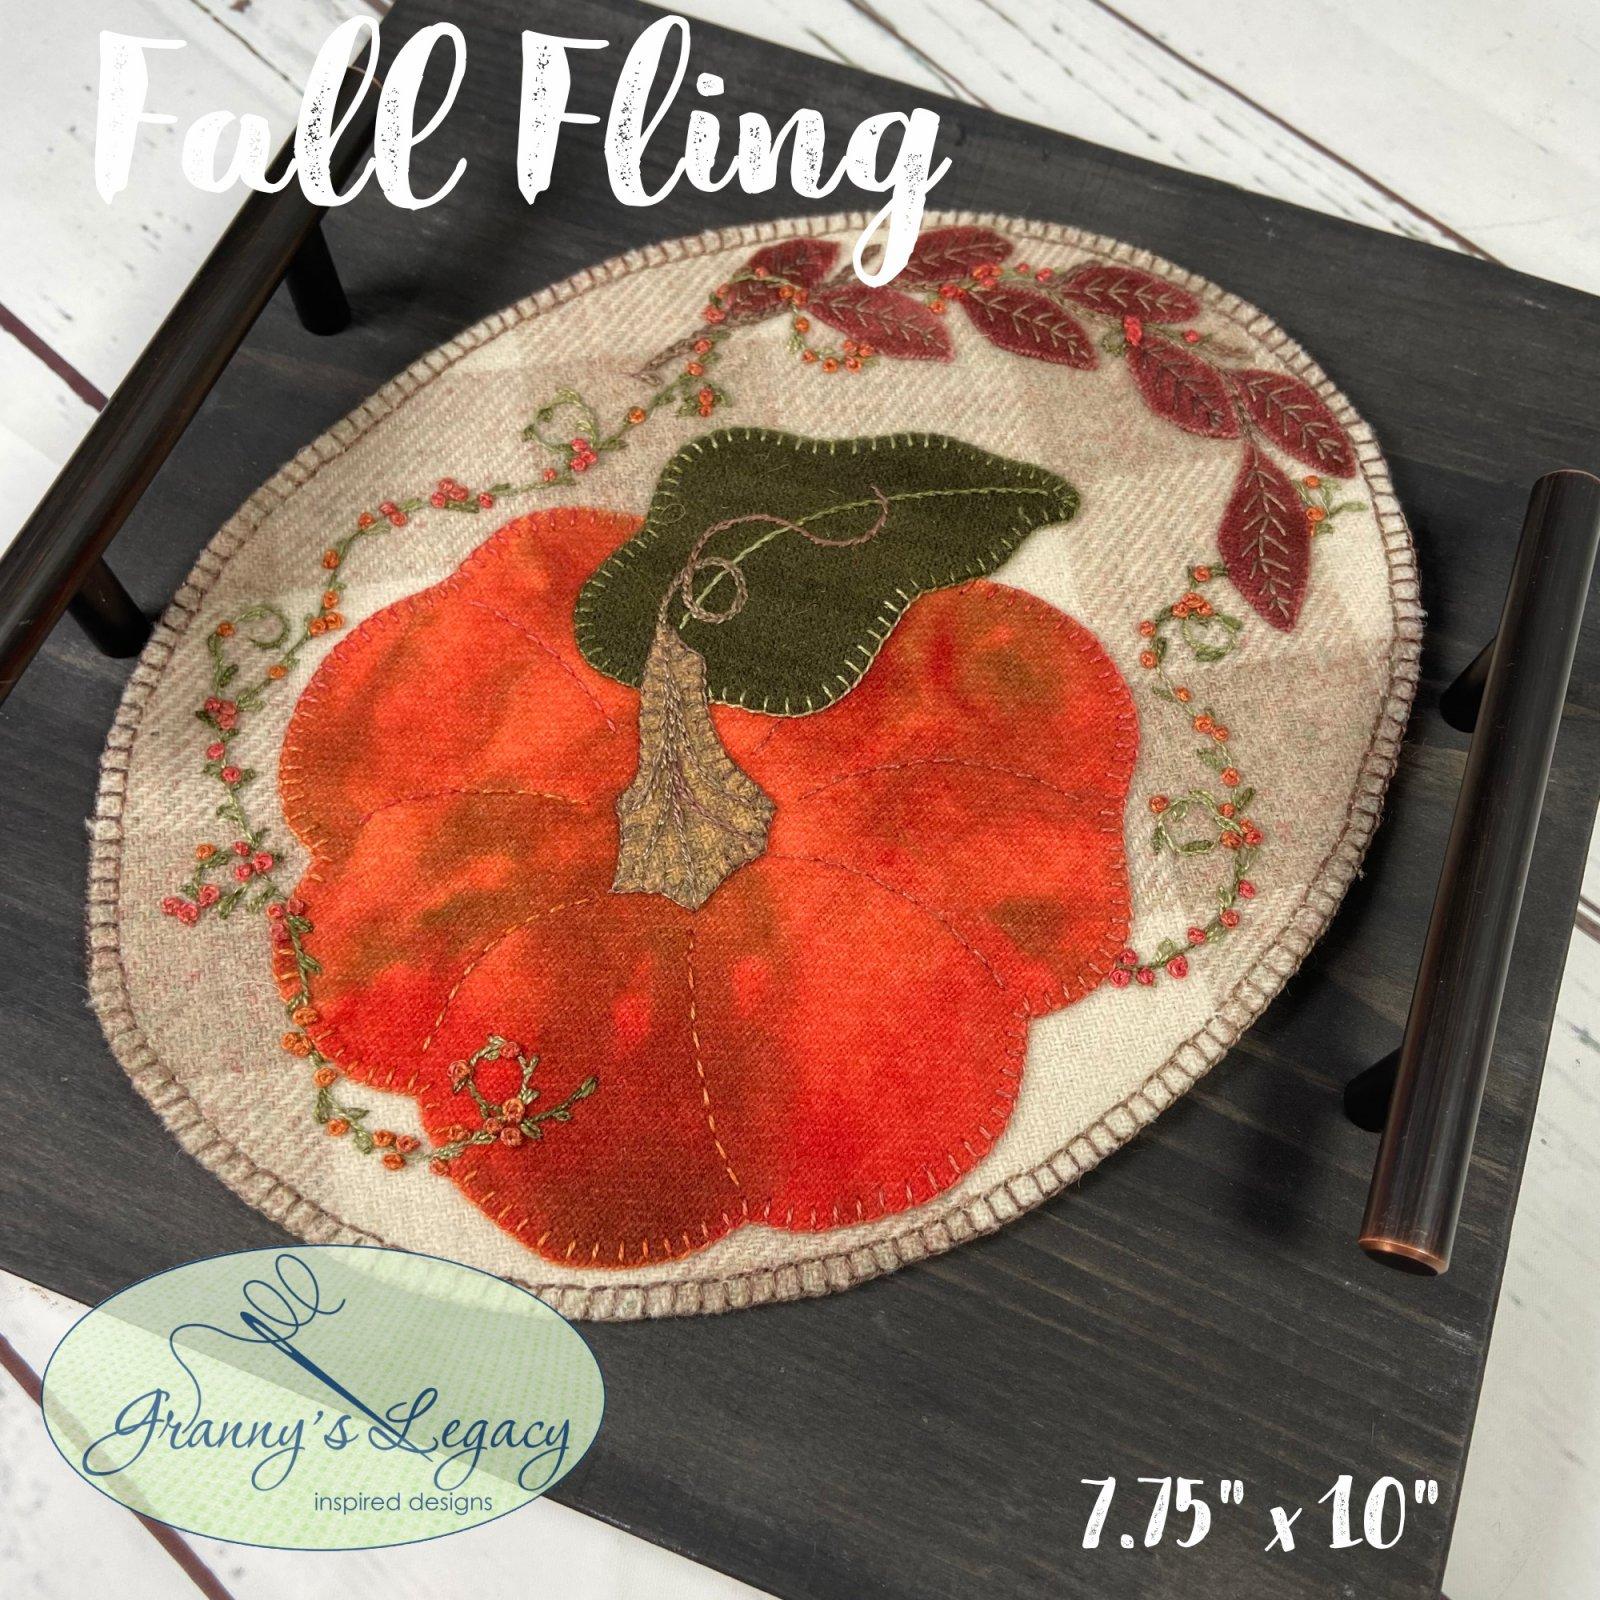 Fall Fling FREE Pattern Download